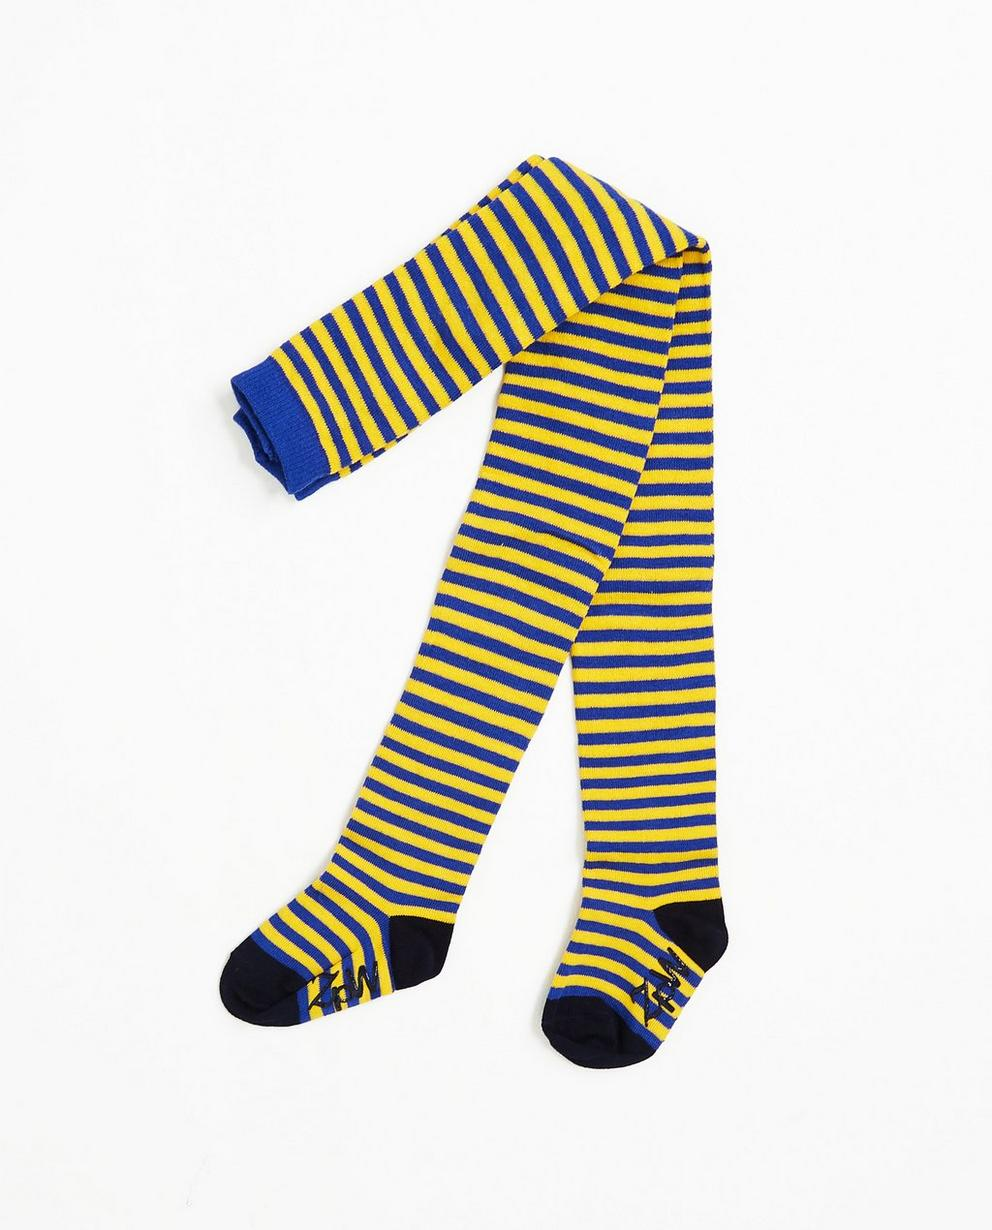 Collant rayé - jaune et bleu, ZulupaPUWA - ZulupaPUWA